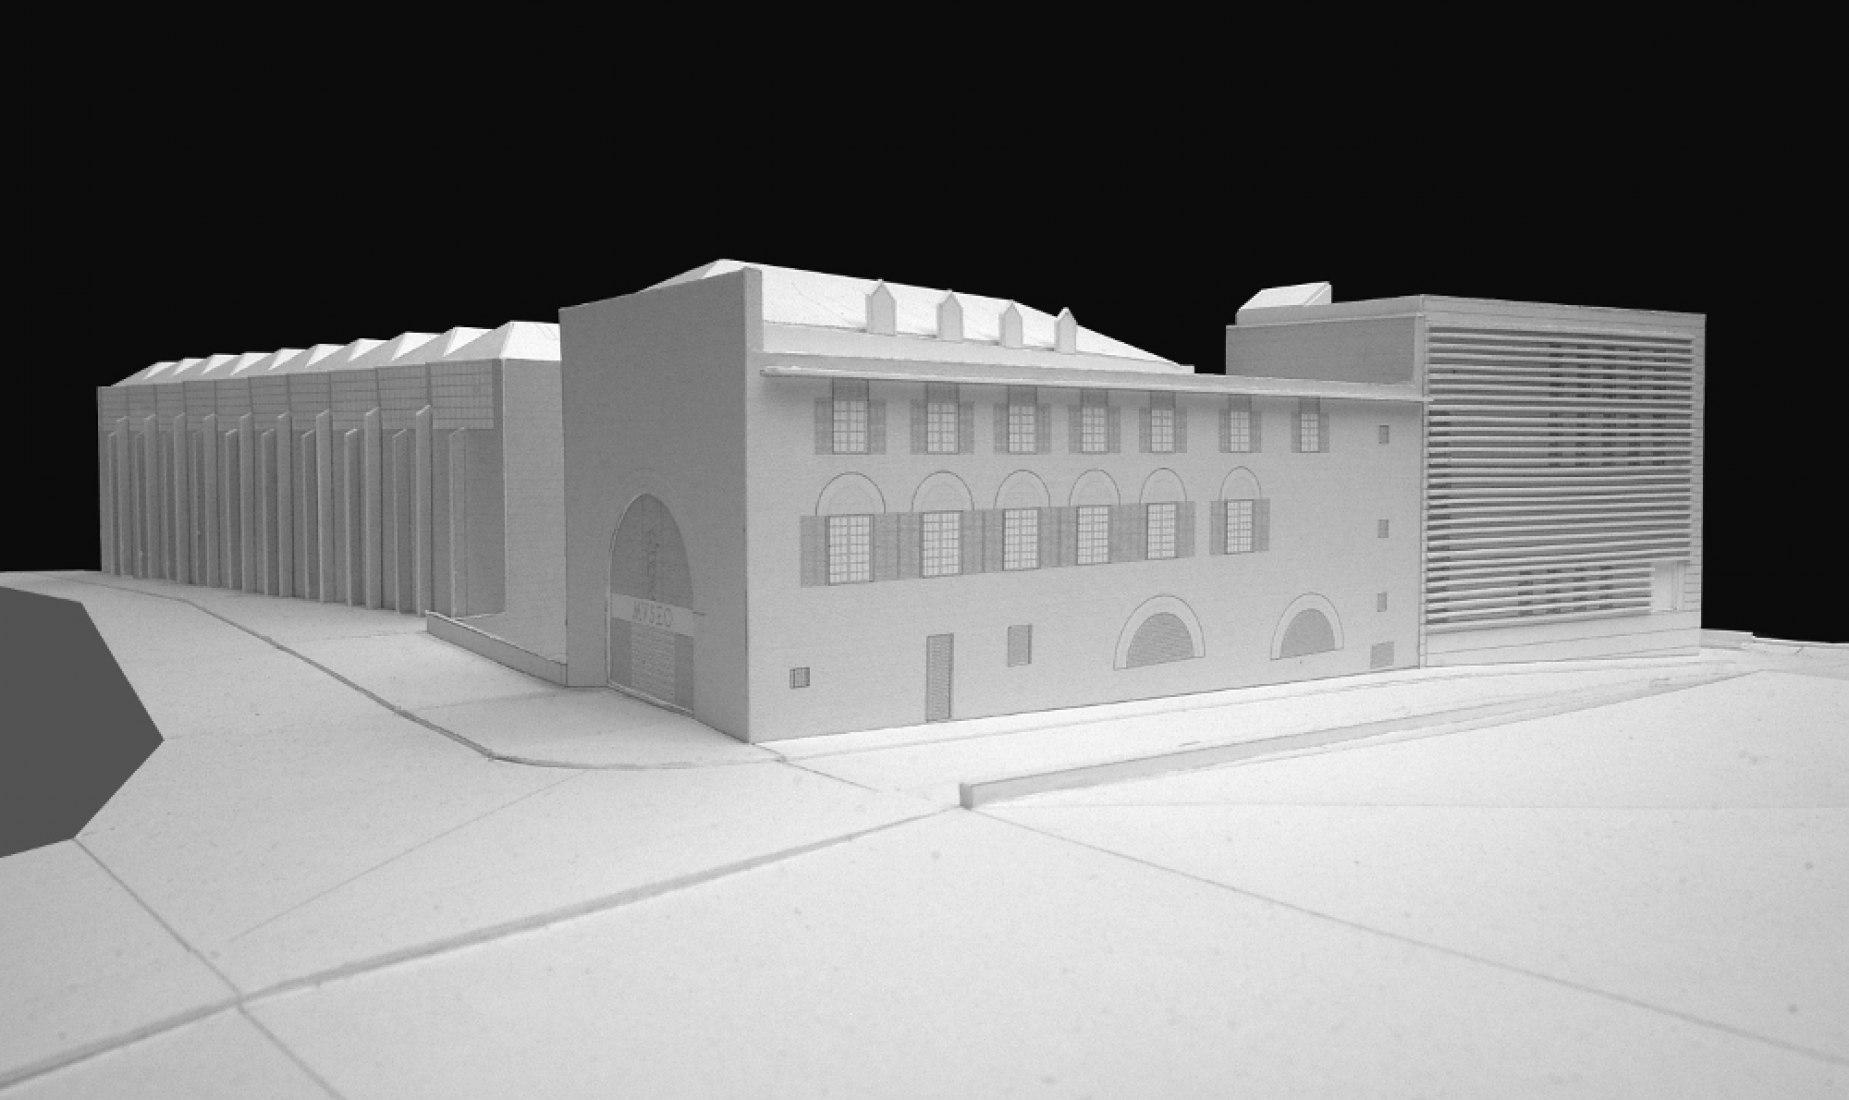 Visualización exterior. Ampliación del Museo Nacional de Arte Romano de Mérida por Rafael Moneo